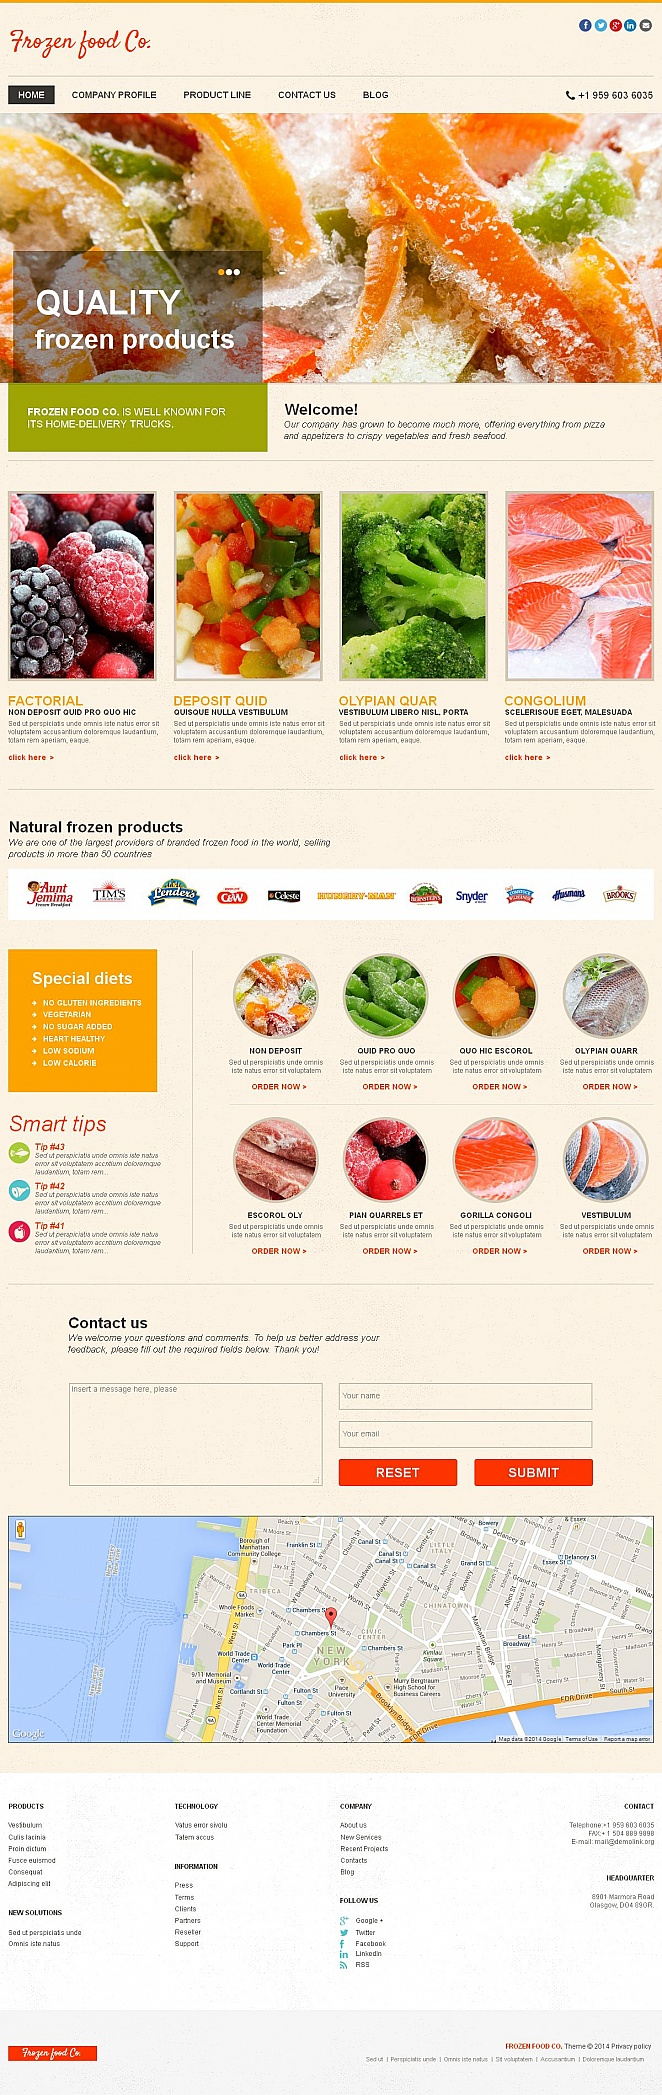 Frozen Food Website Template with Image Slider - image